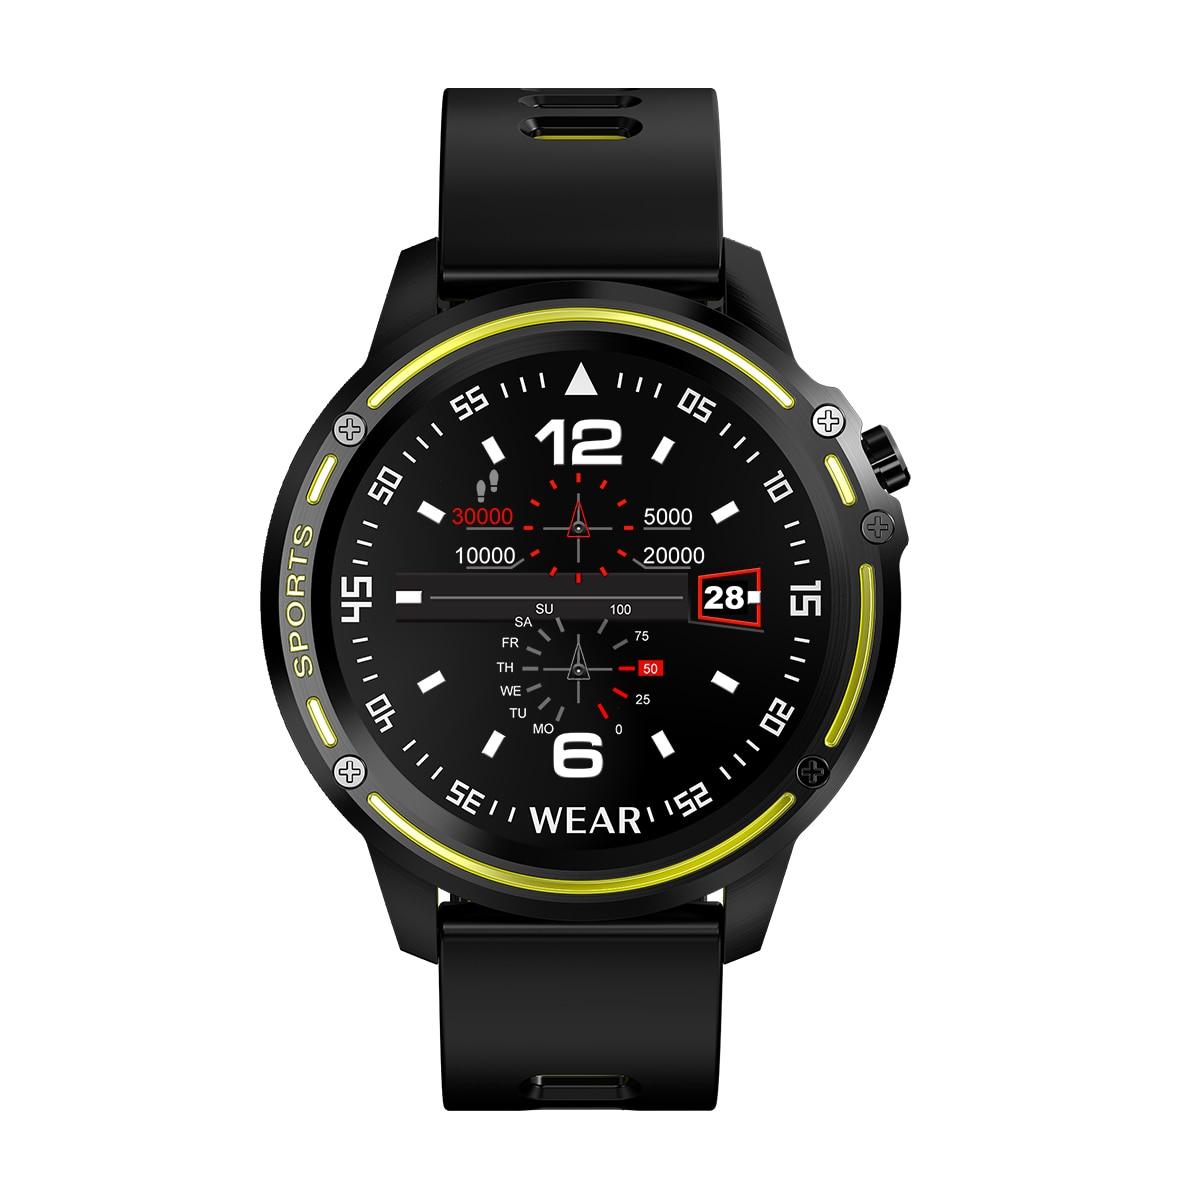 2020 L8 P3 nuevo 5G Bluetooth tarjeta de pago NFC reloj amazfit trex applu reloj Serie 3amazfit bip 2 l9 reloj inteligente bluetooth reloj